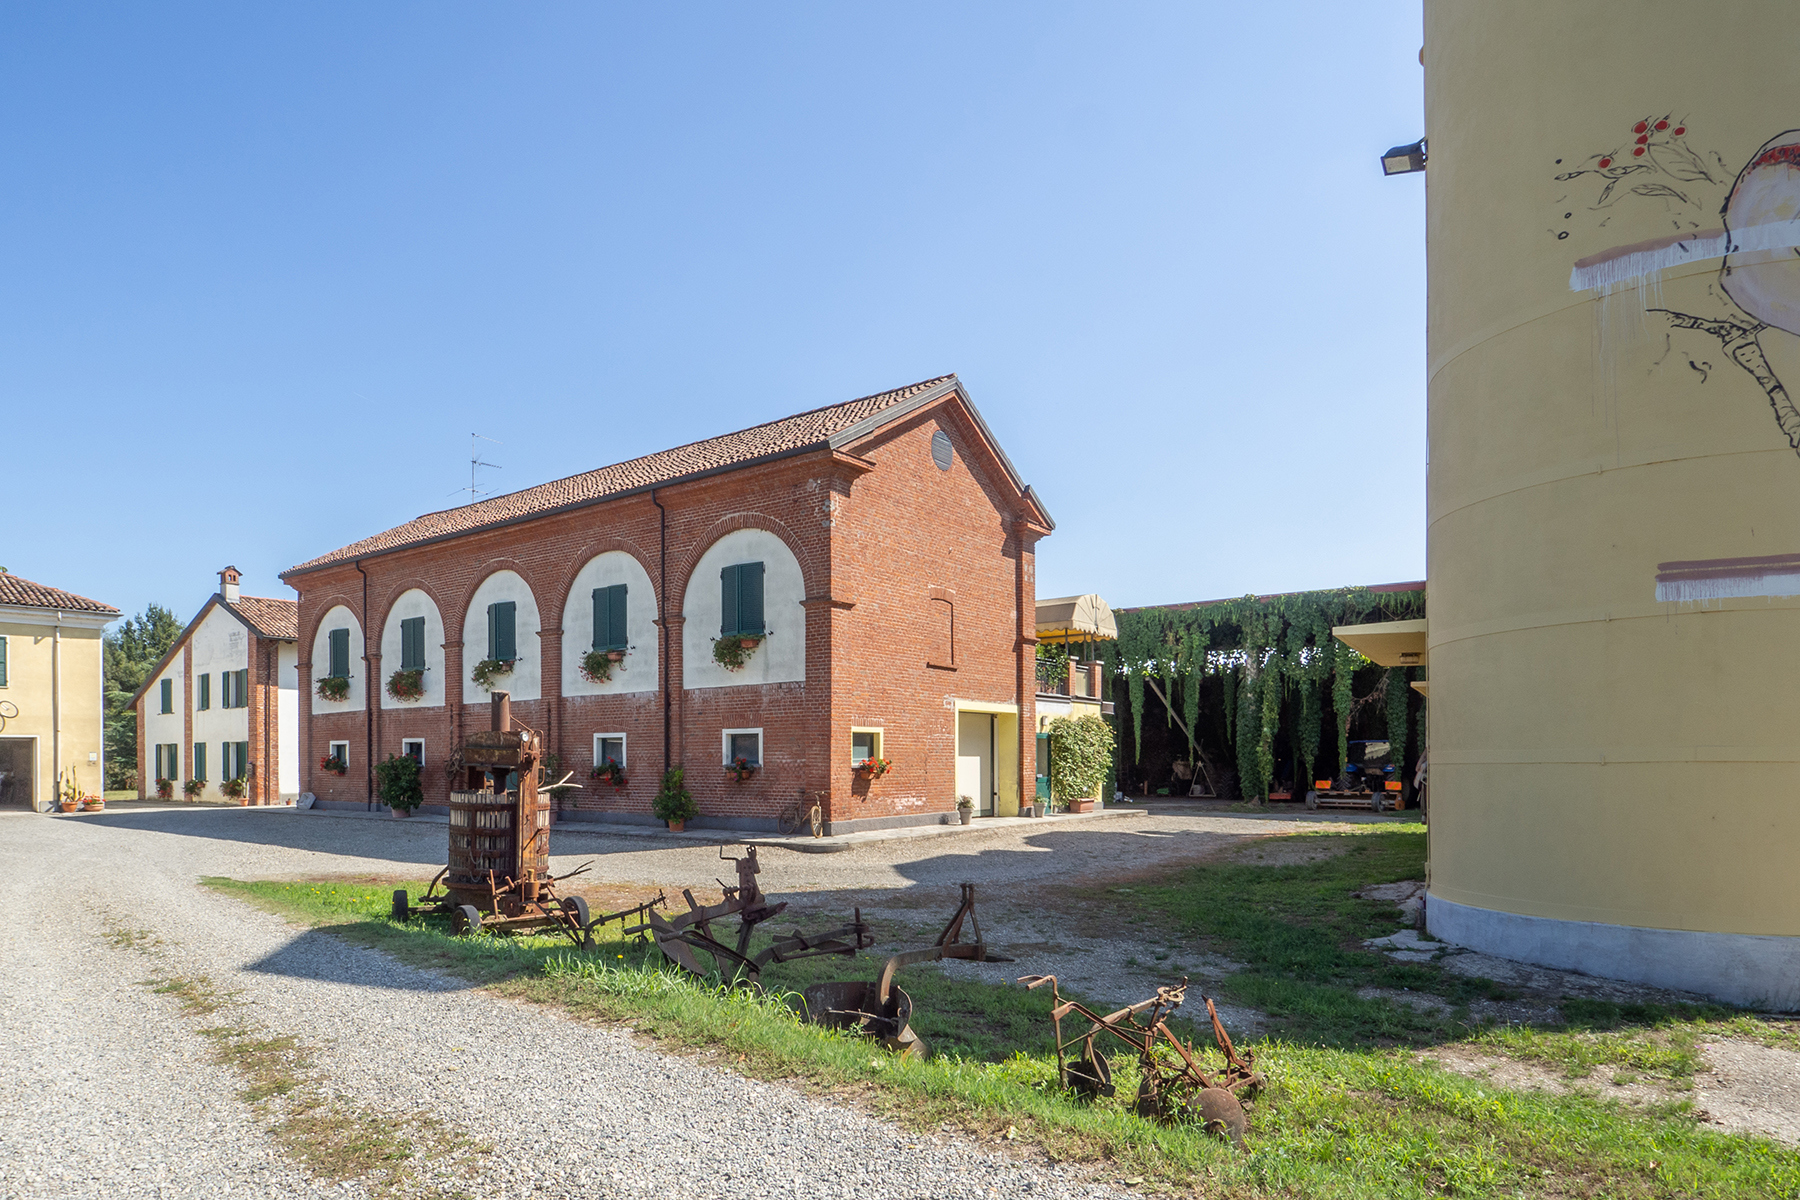 Rustico in Vendita a Valenza: 5 locali, 1800 mq - Foto 3